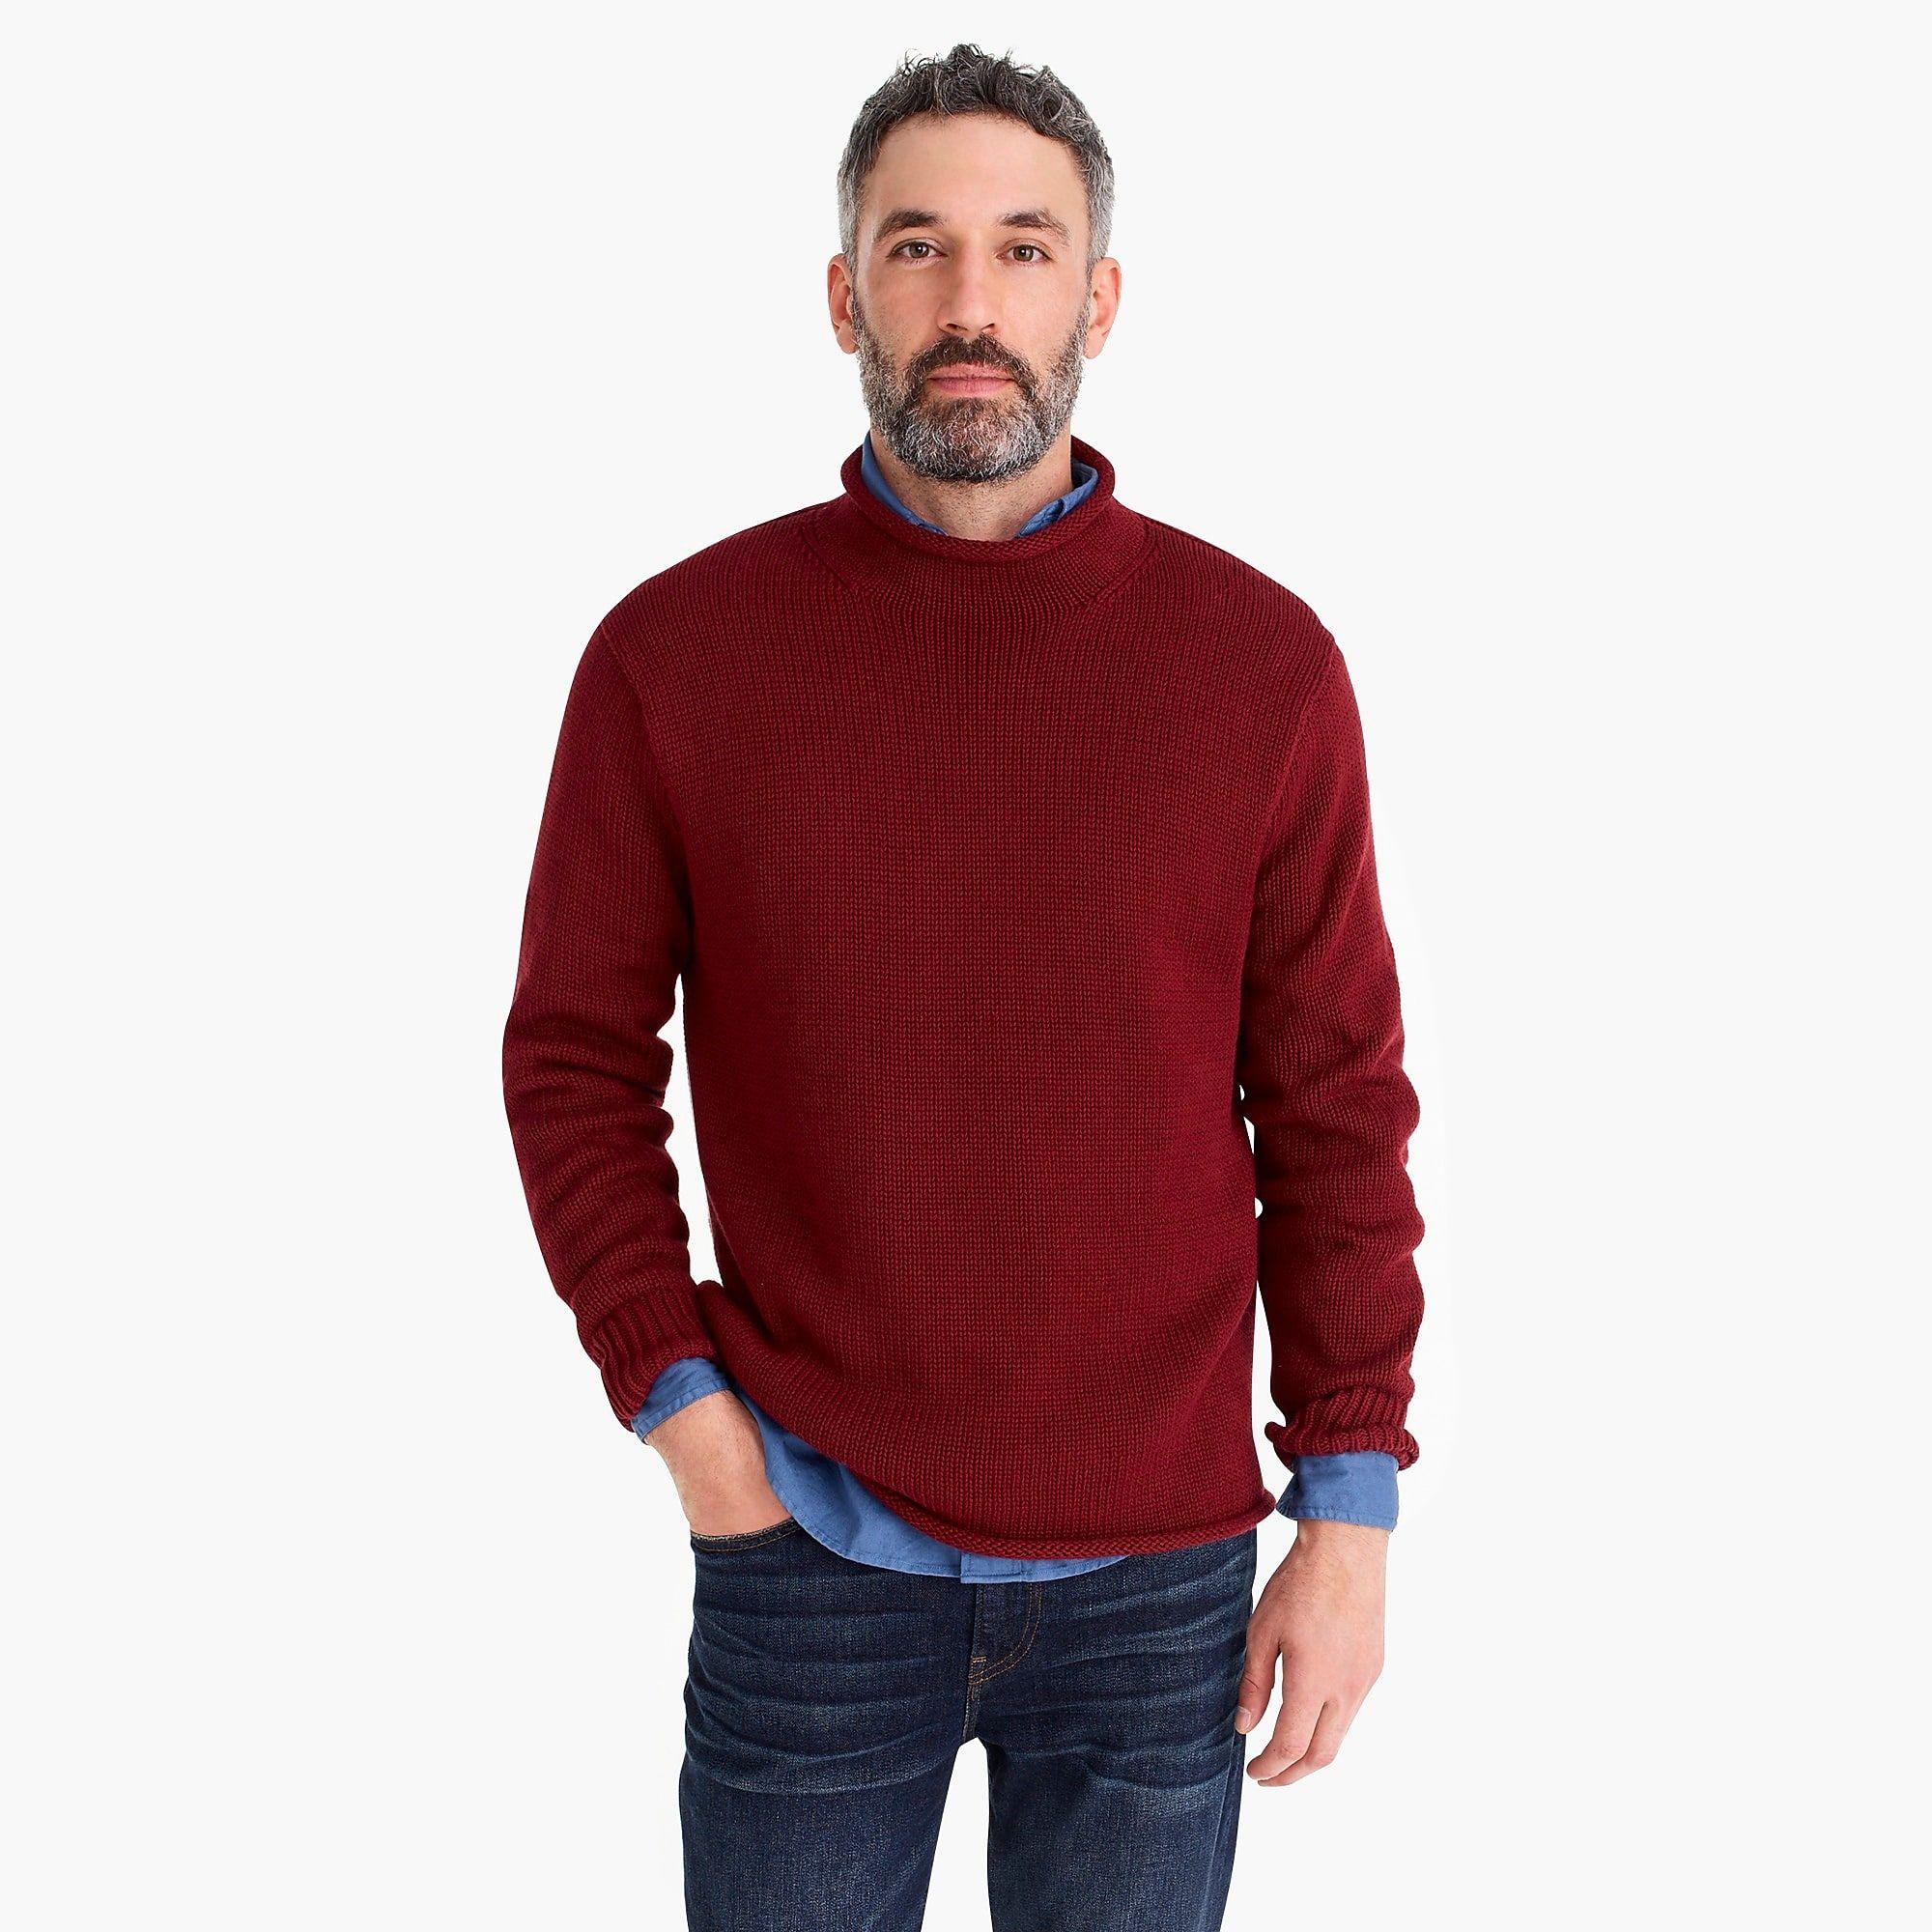 7cc2154fe Unisex 1988 cotton rollneck sweater - Men's Sweaters | J.Crew | MENS ...